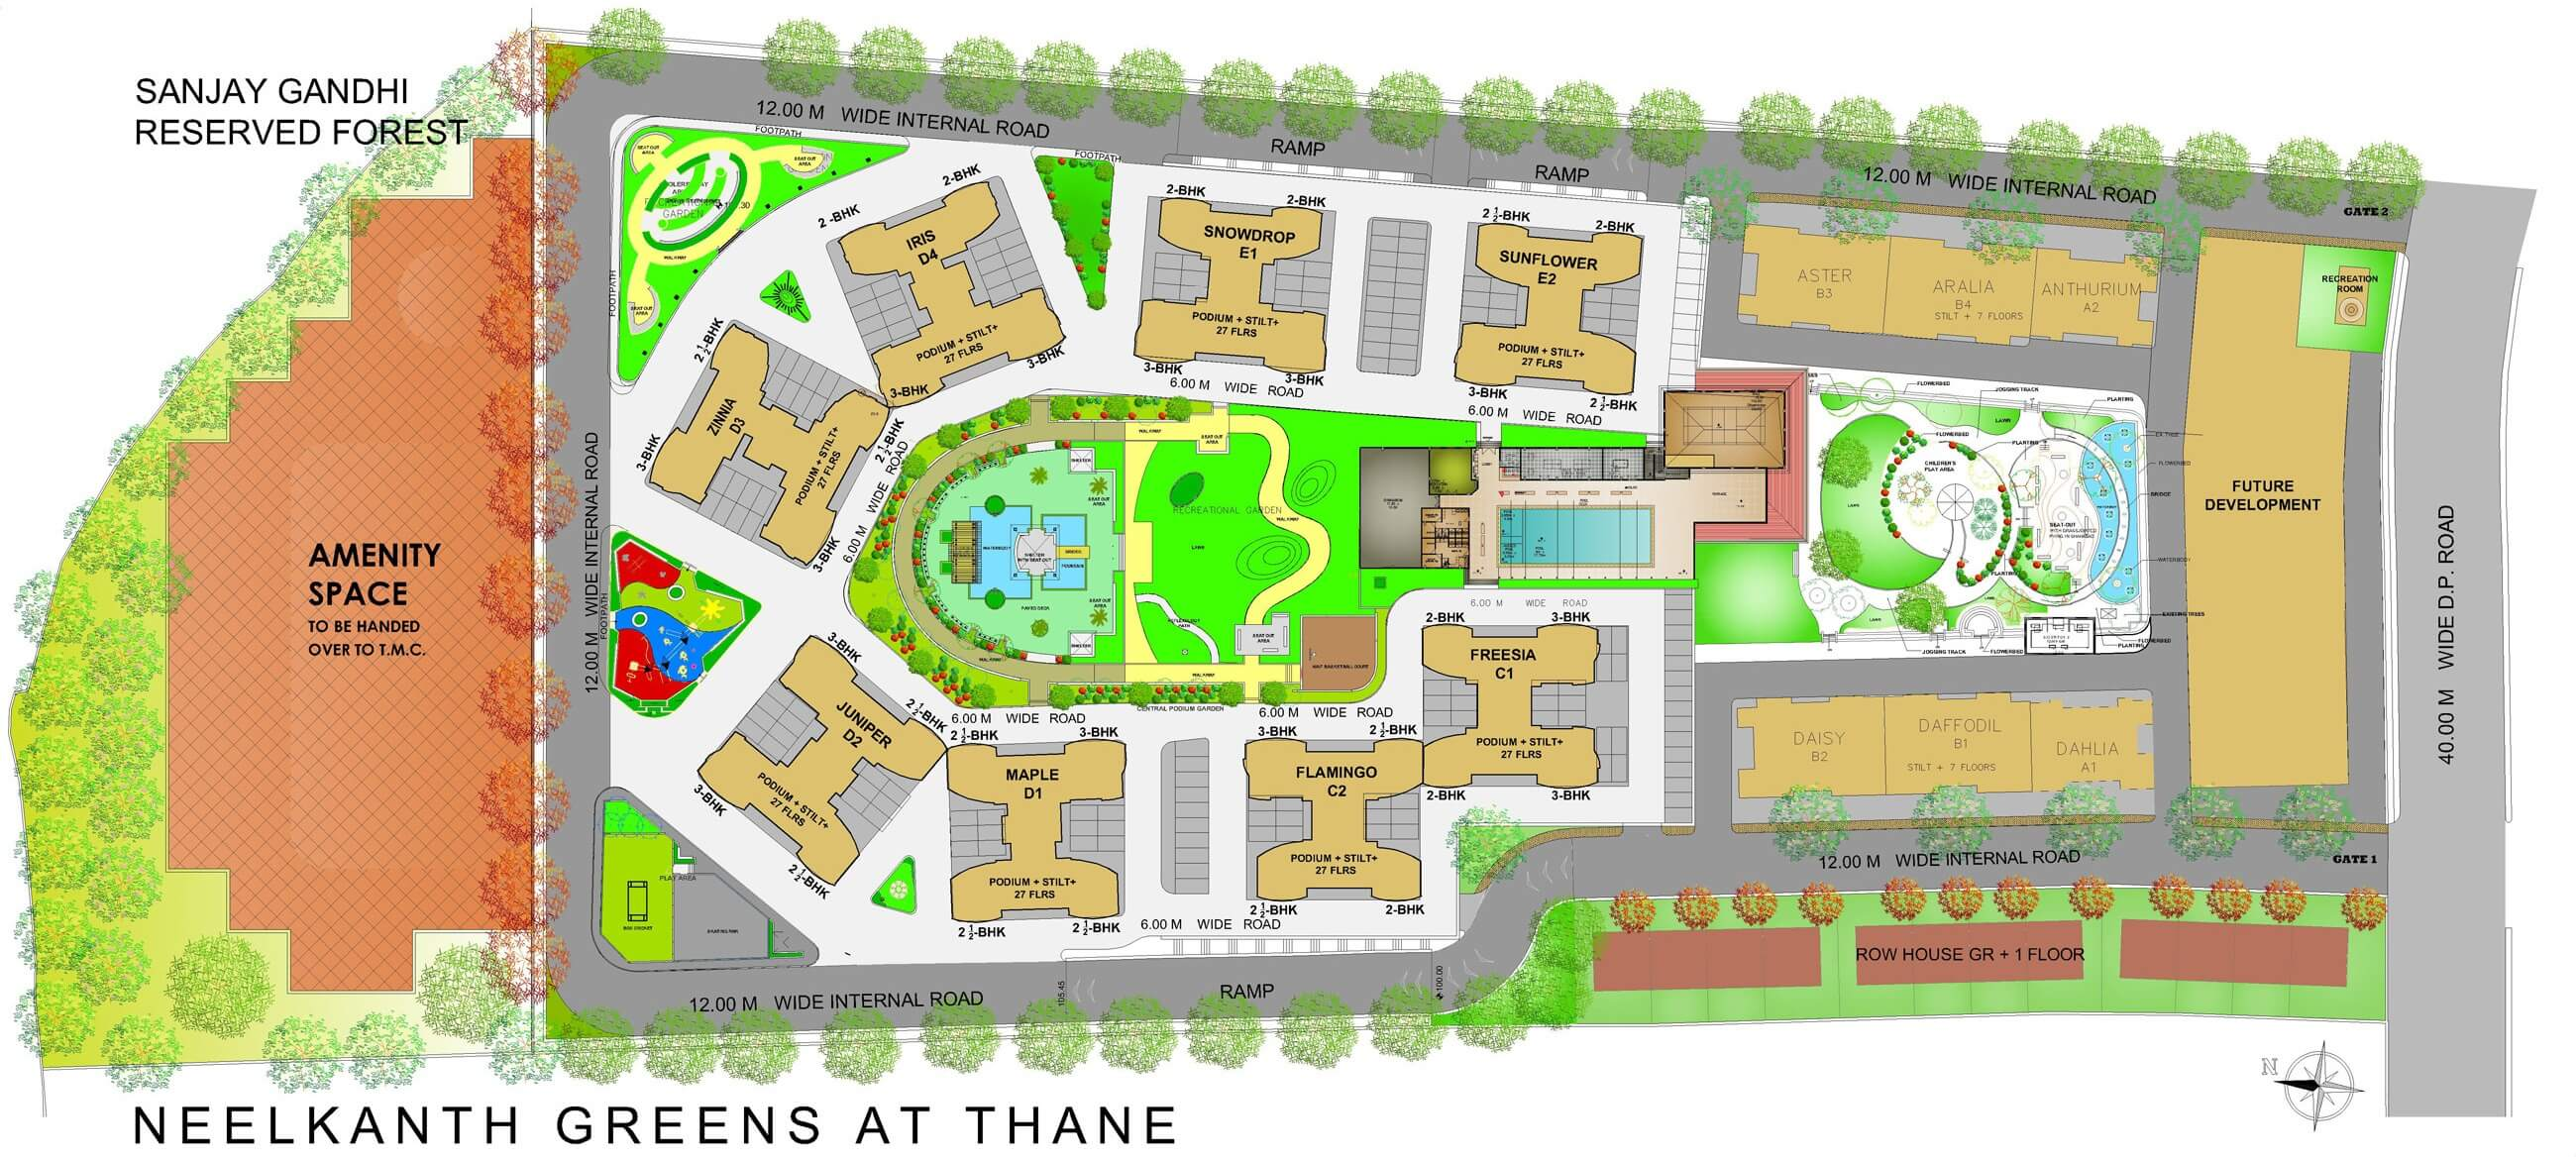 neelkanth greens master plan image1